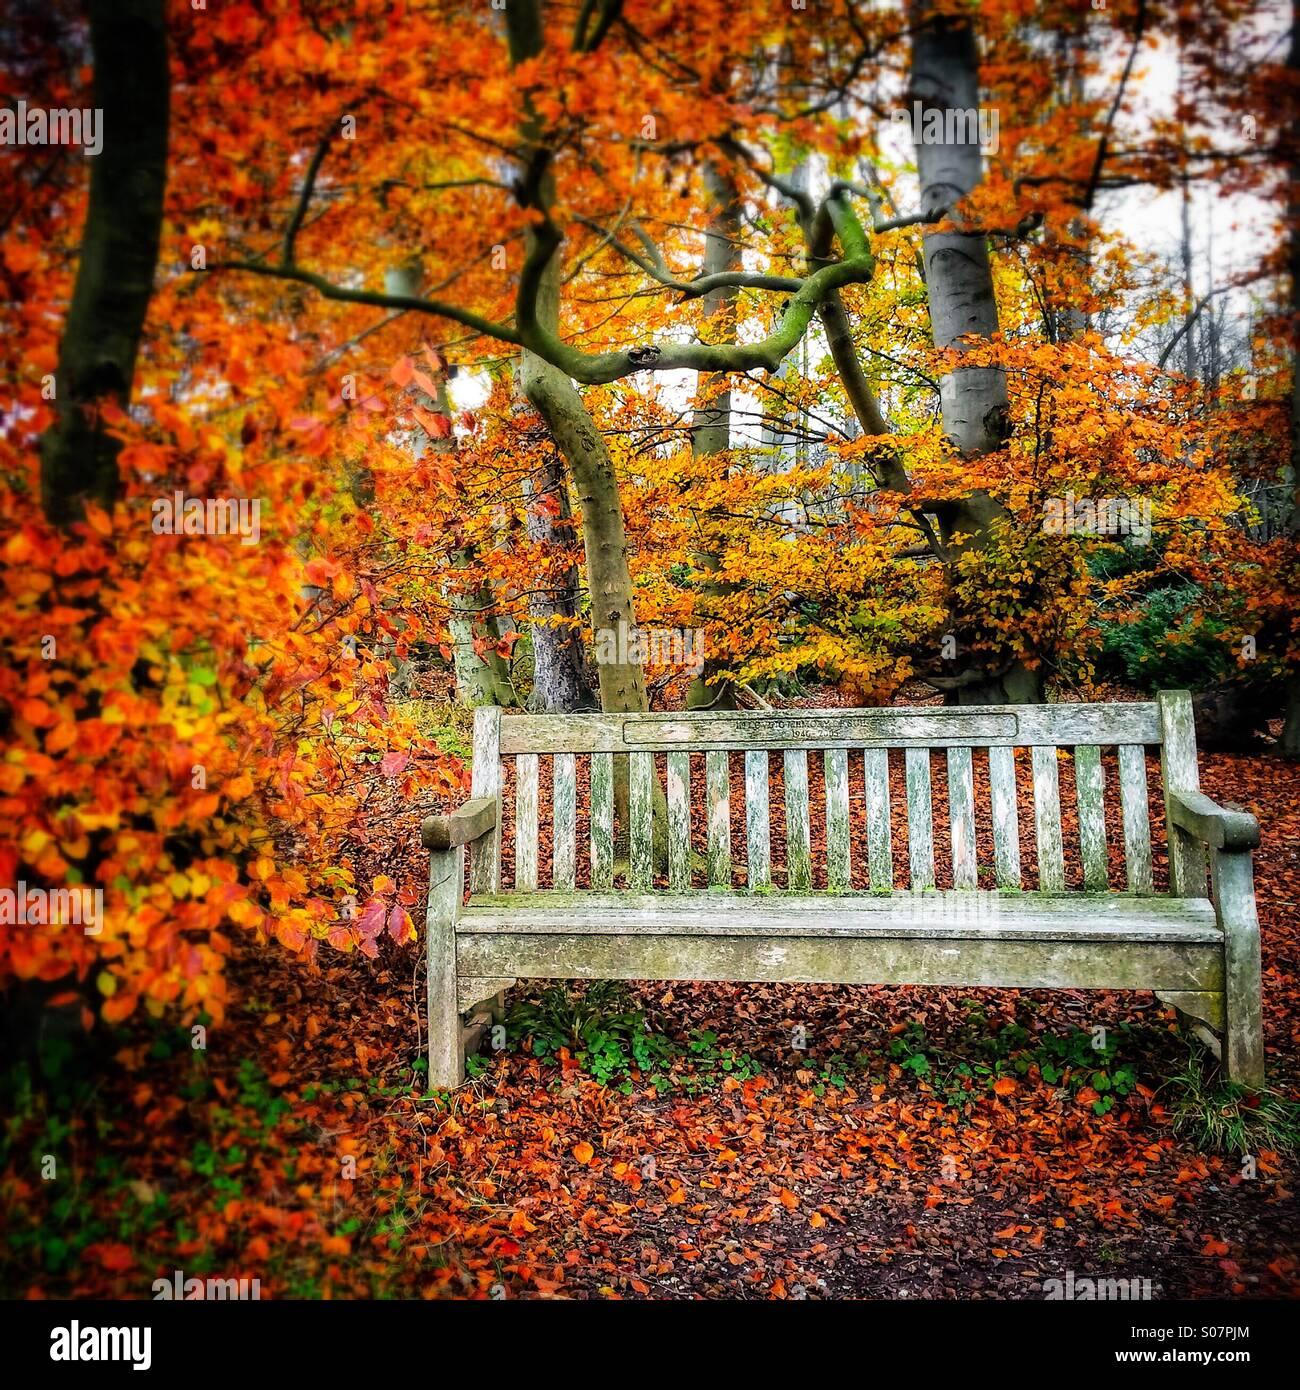 Autumn colours bench at Wandlebury Country Park, Cambridge, England - Stock Image